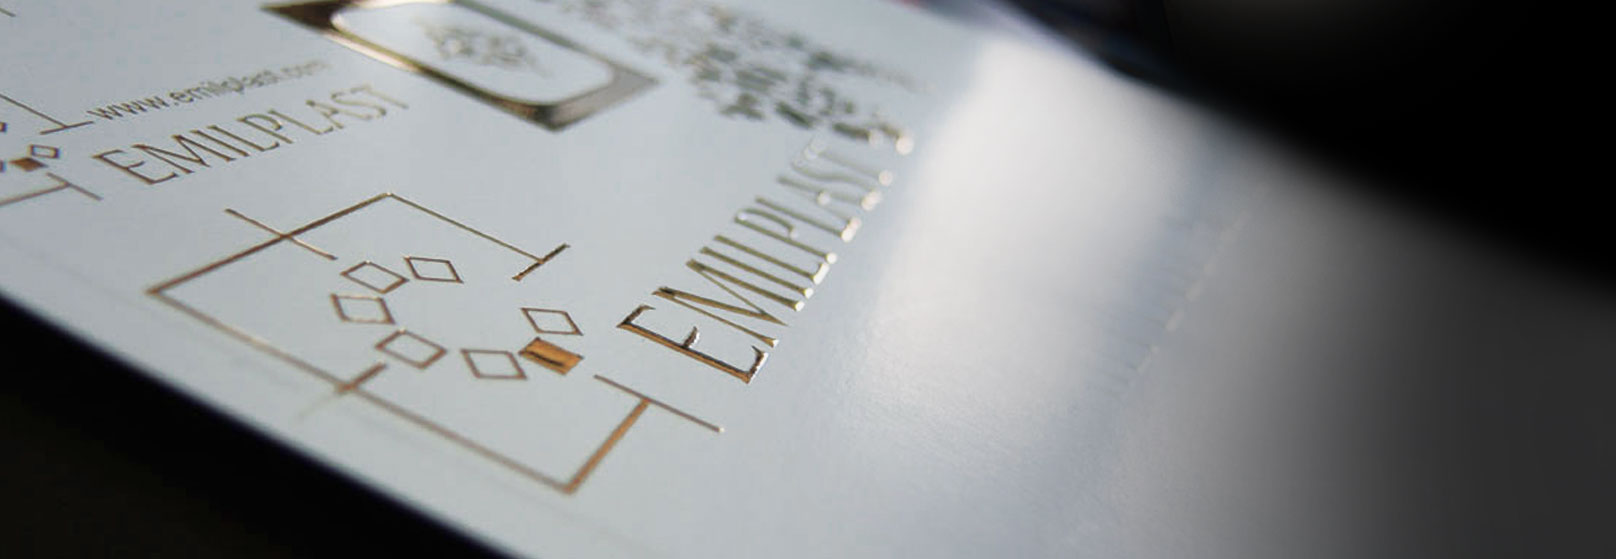 emilplast-stampacaldo